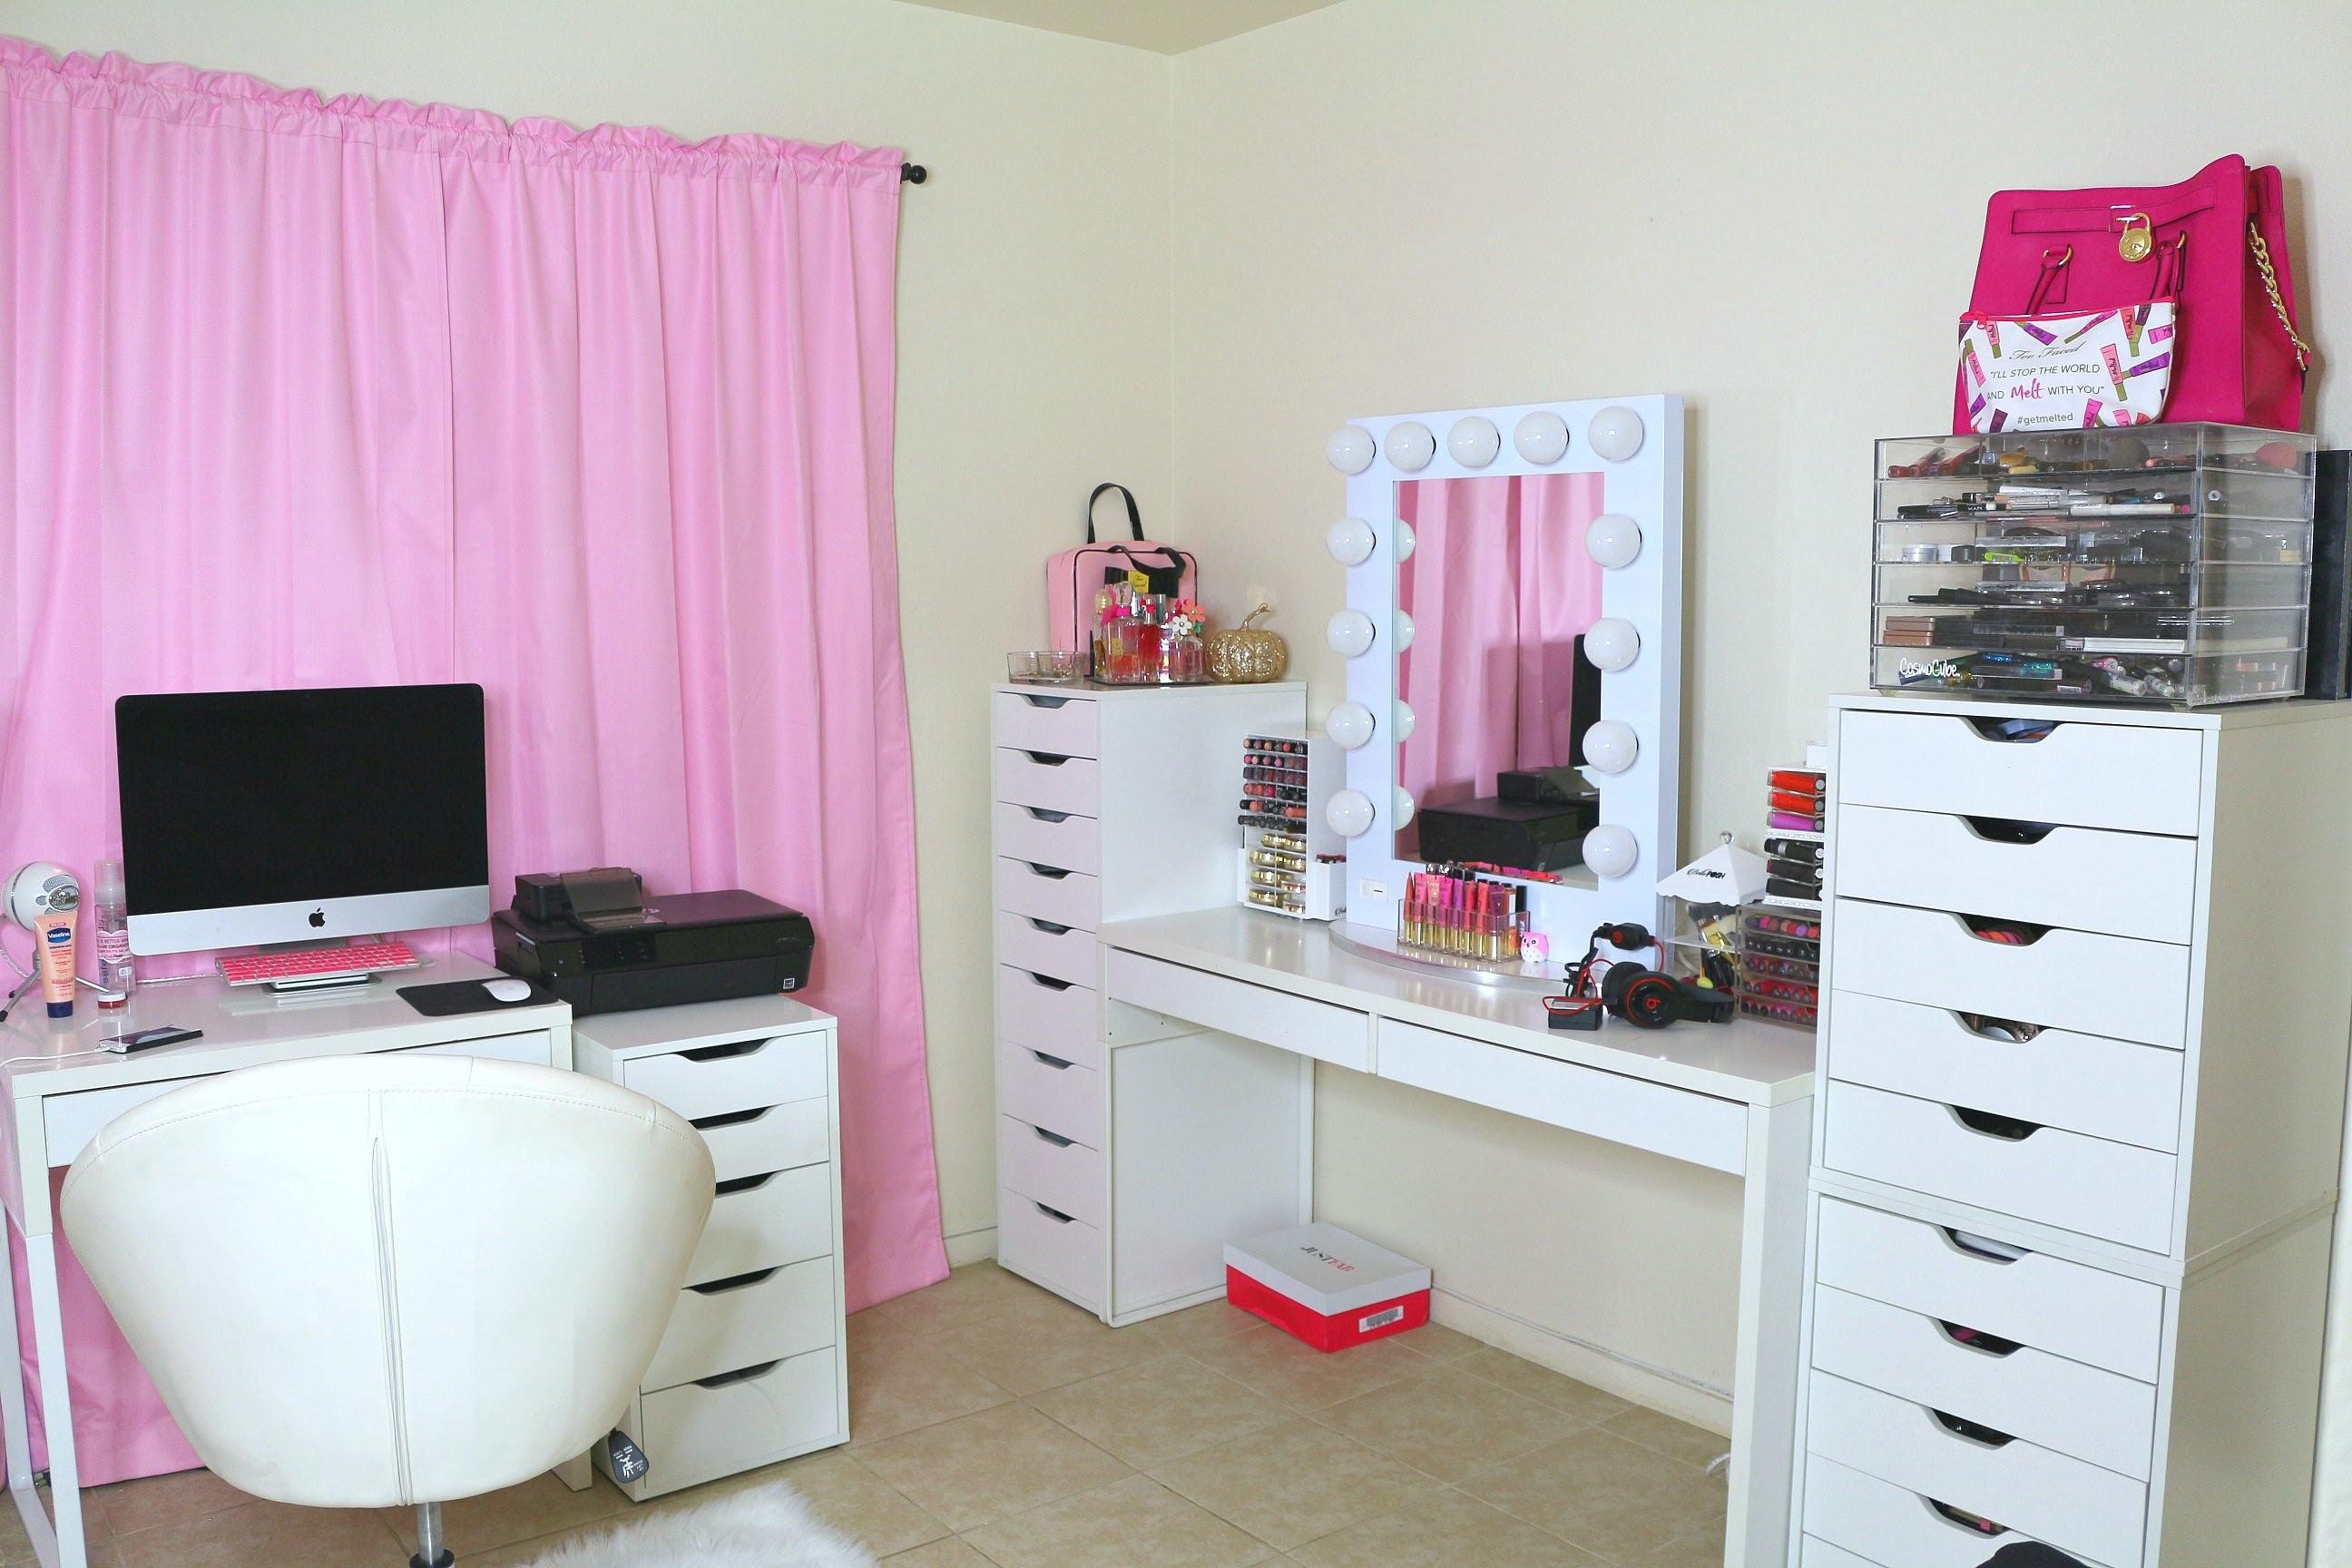 Cuarto de maquillaje estudio makeup room tour my crafts - Estudio de maquillaje ...